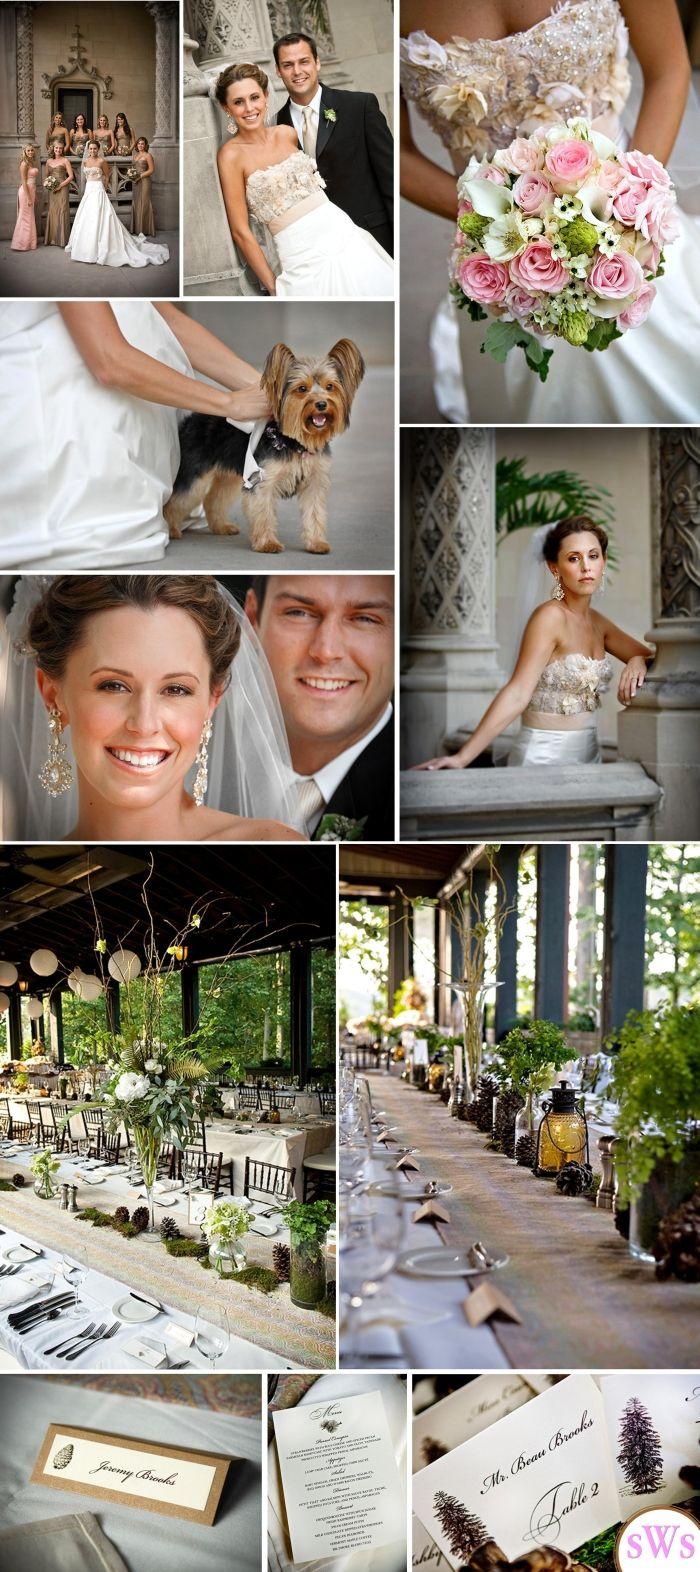 Formal Rustic Wedding: Edge Decor, Bridesmaid Dresses, Colors, Rustic Chic, Pine Cones, Card, Rustic Weddings, Rustic Wedding Chic, Formal Rustic